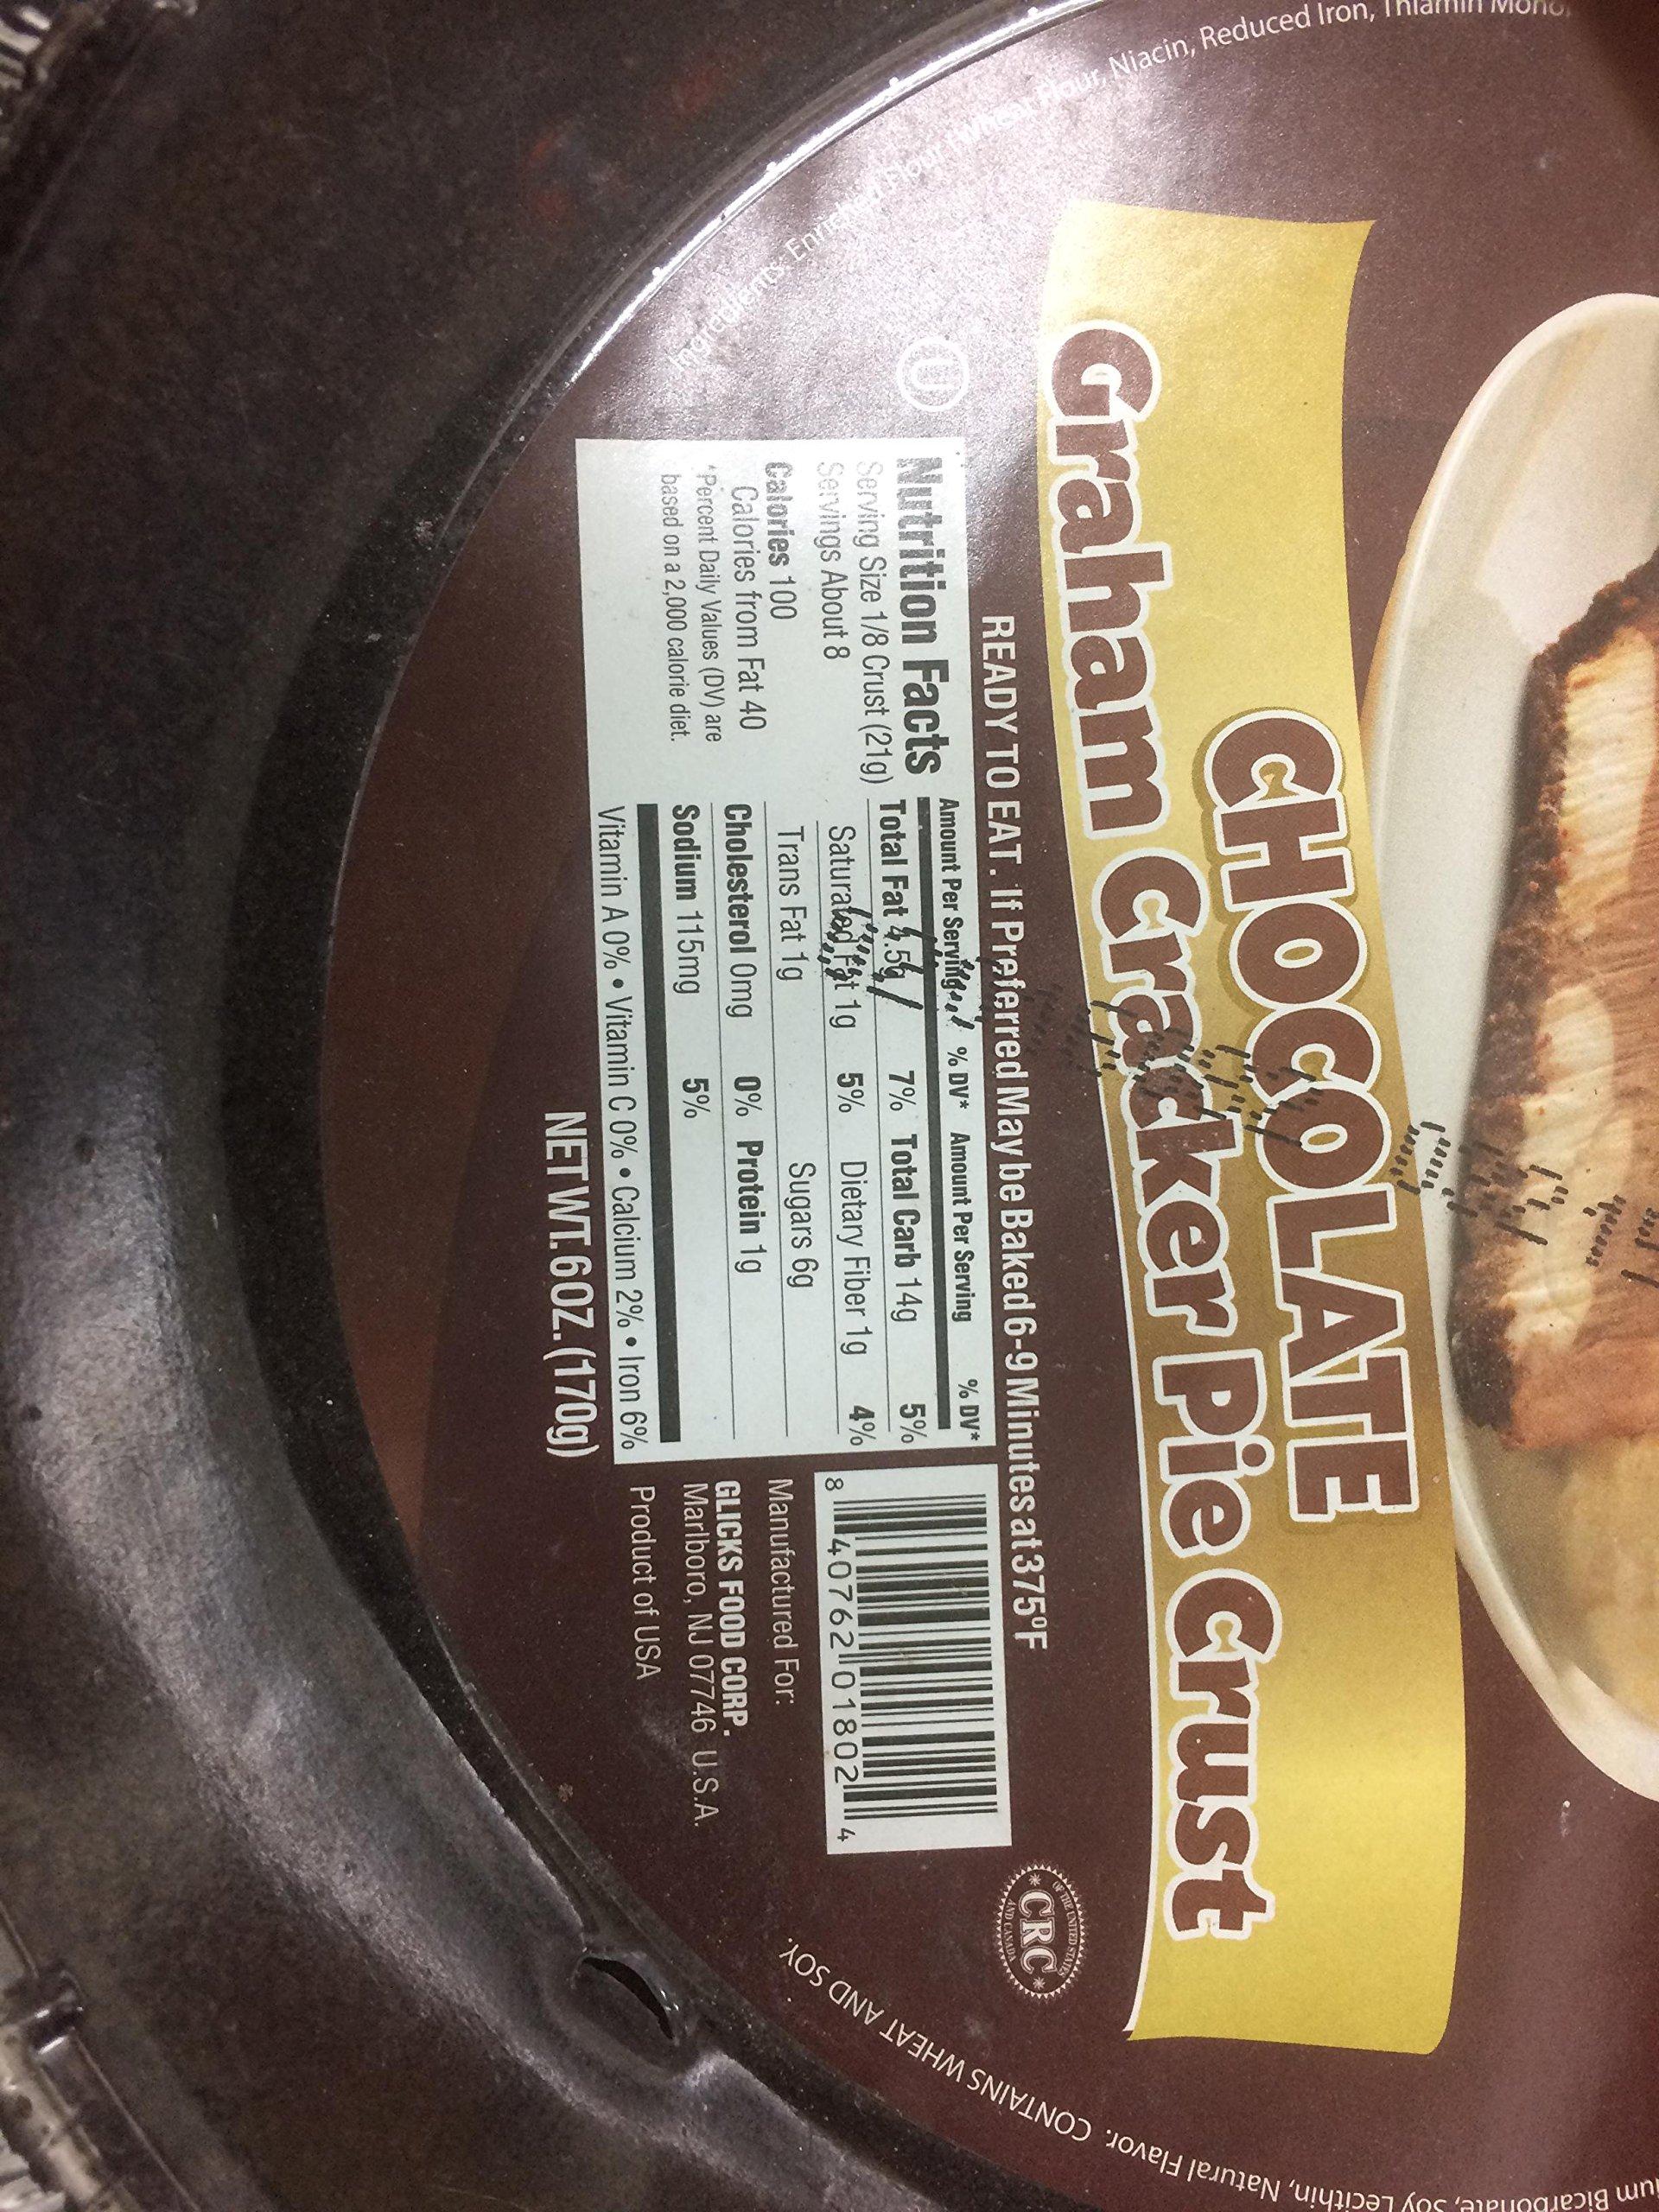 Glicks Finest Chocolate Graham Cracker Pie Crust 6 Oz. Pack Of 3.